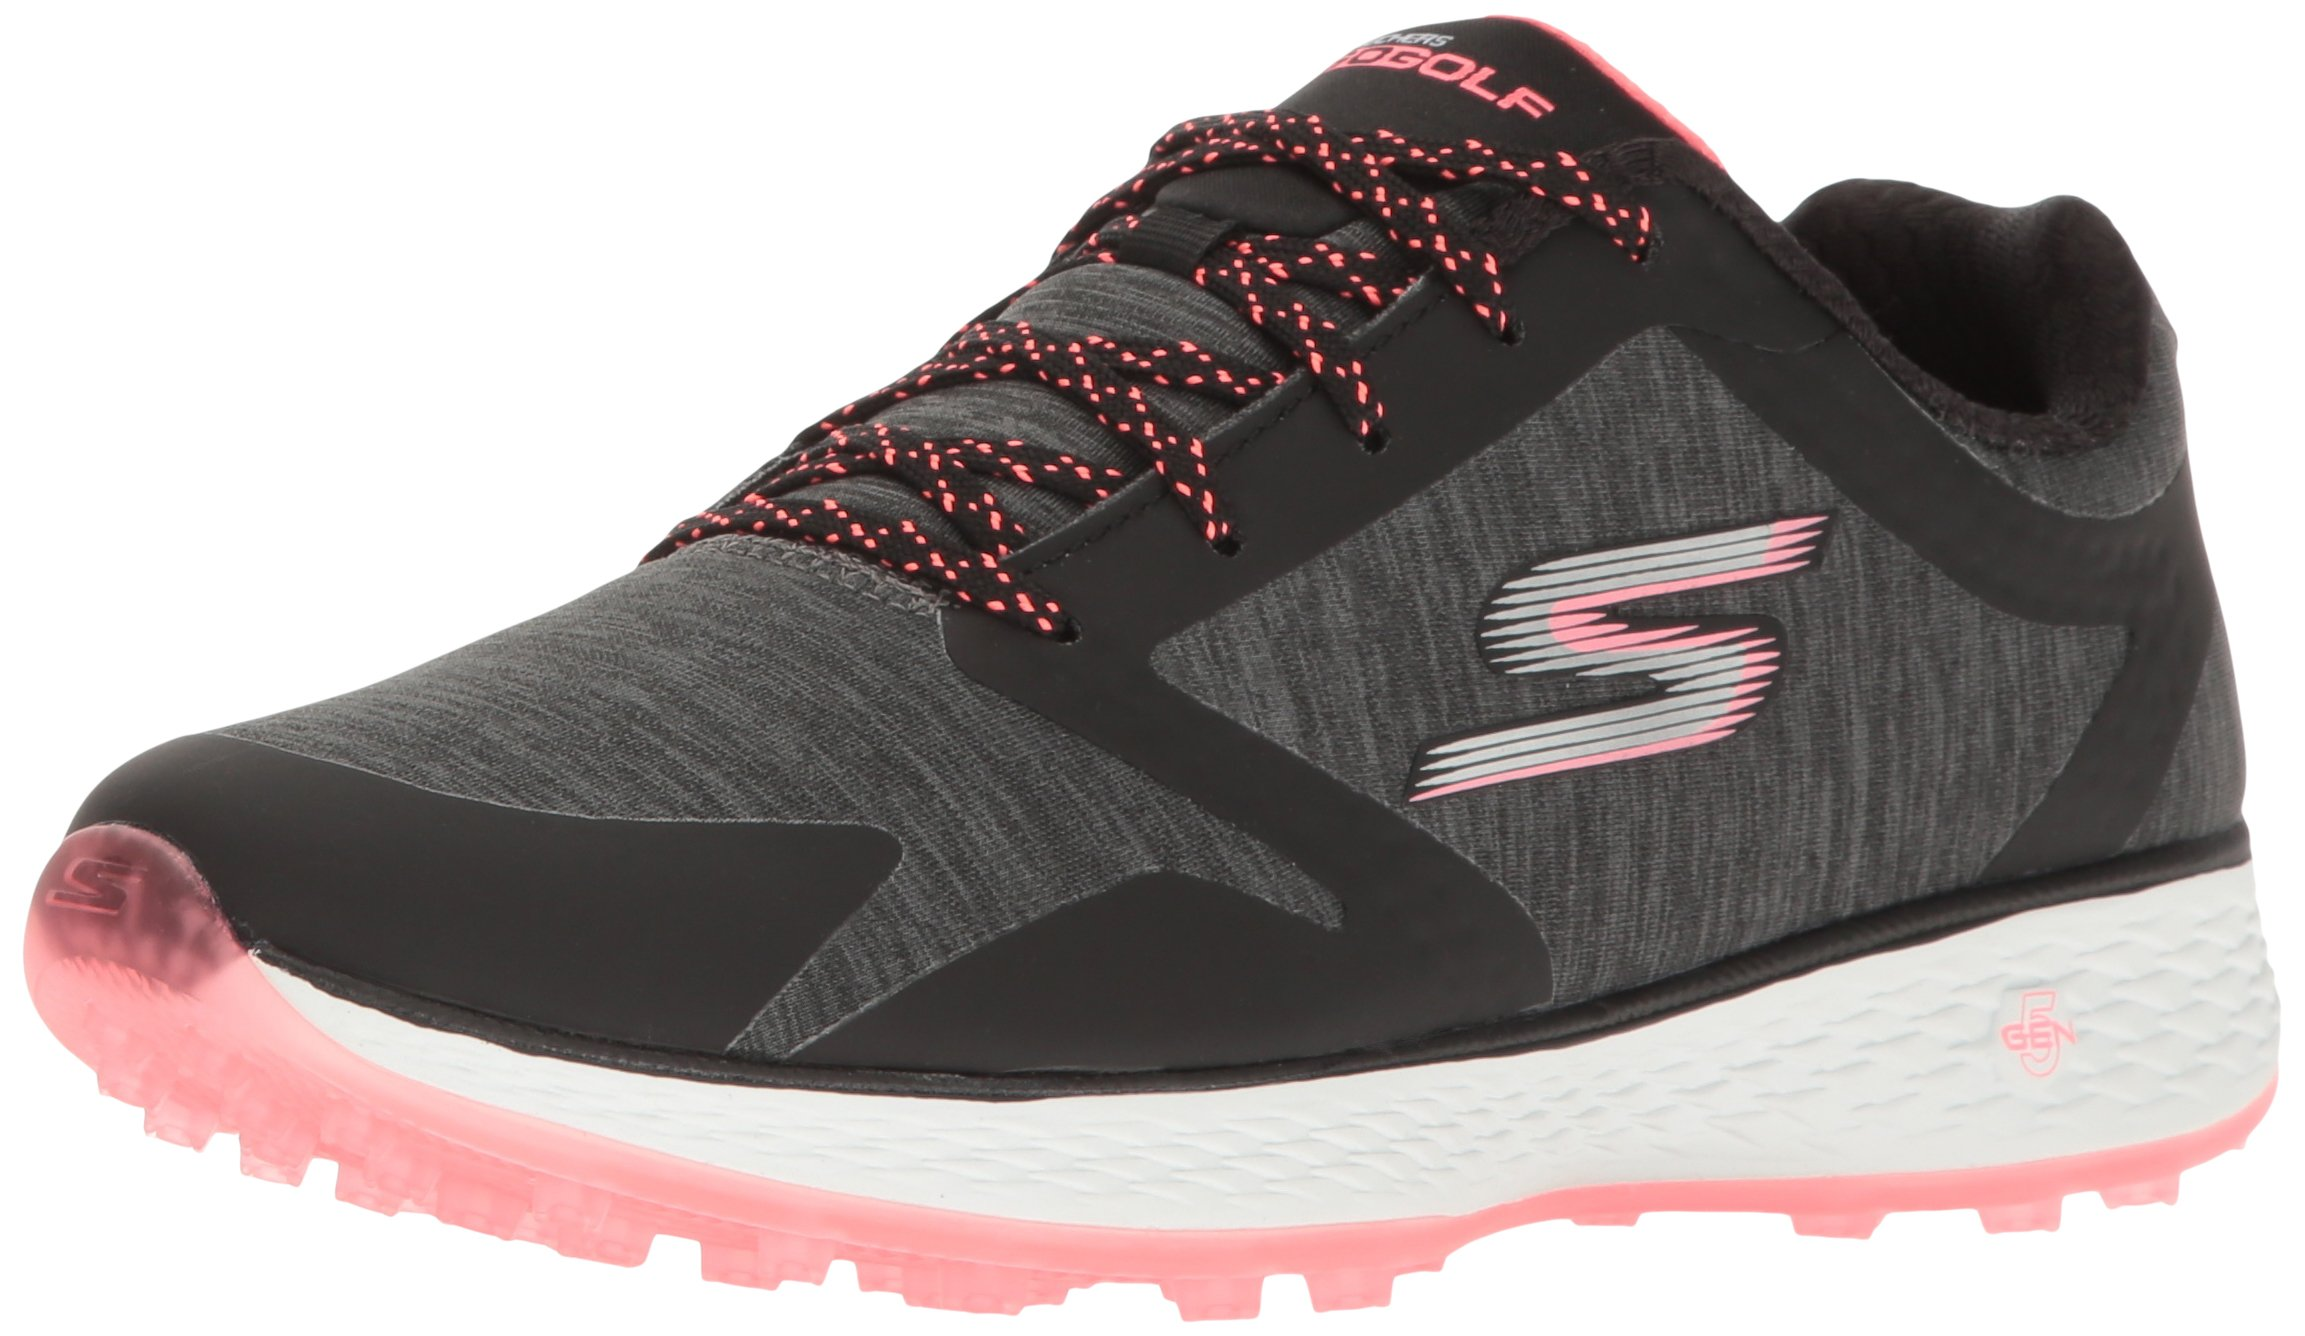 Skechers Performance Women's Go Golf Elite 2 Famed Golf Shoe, Black/Hot Pink Heathered, 8.5 M US